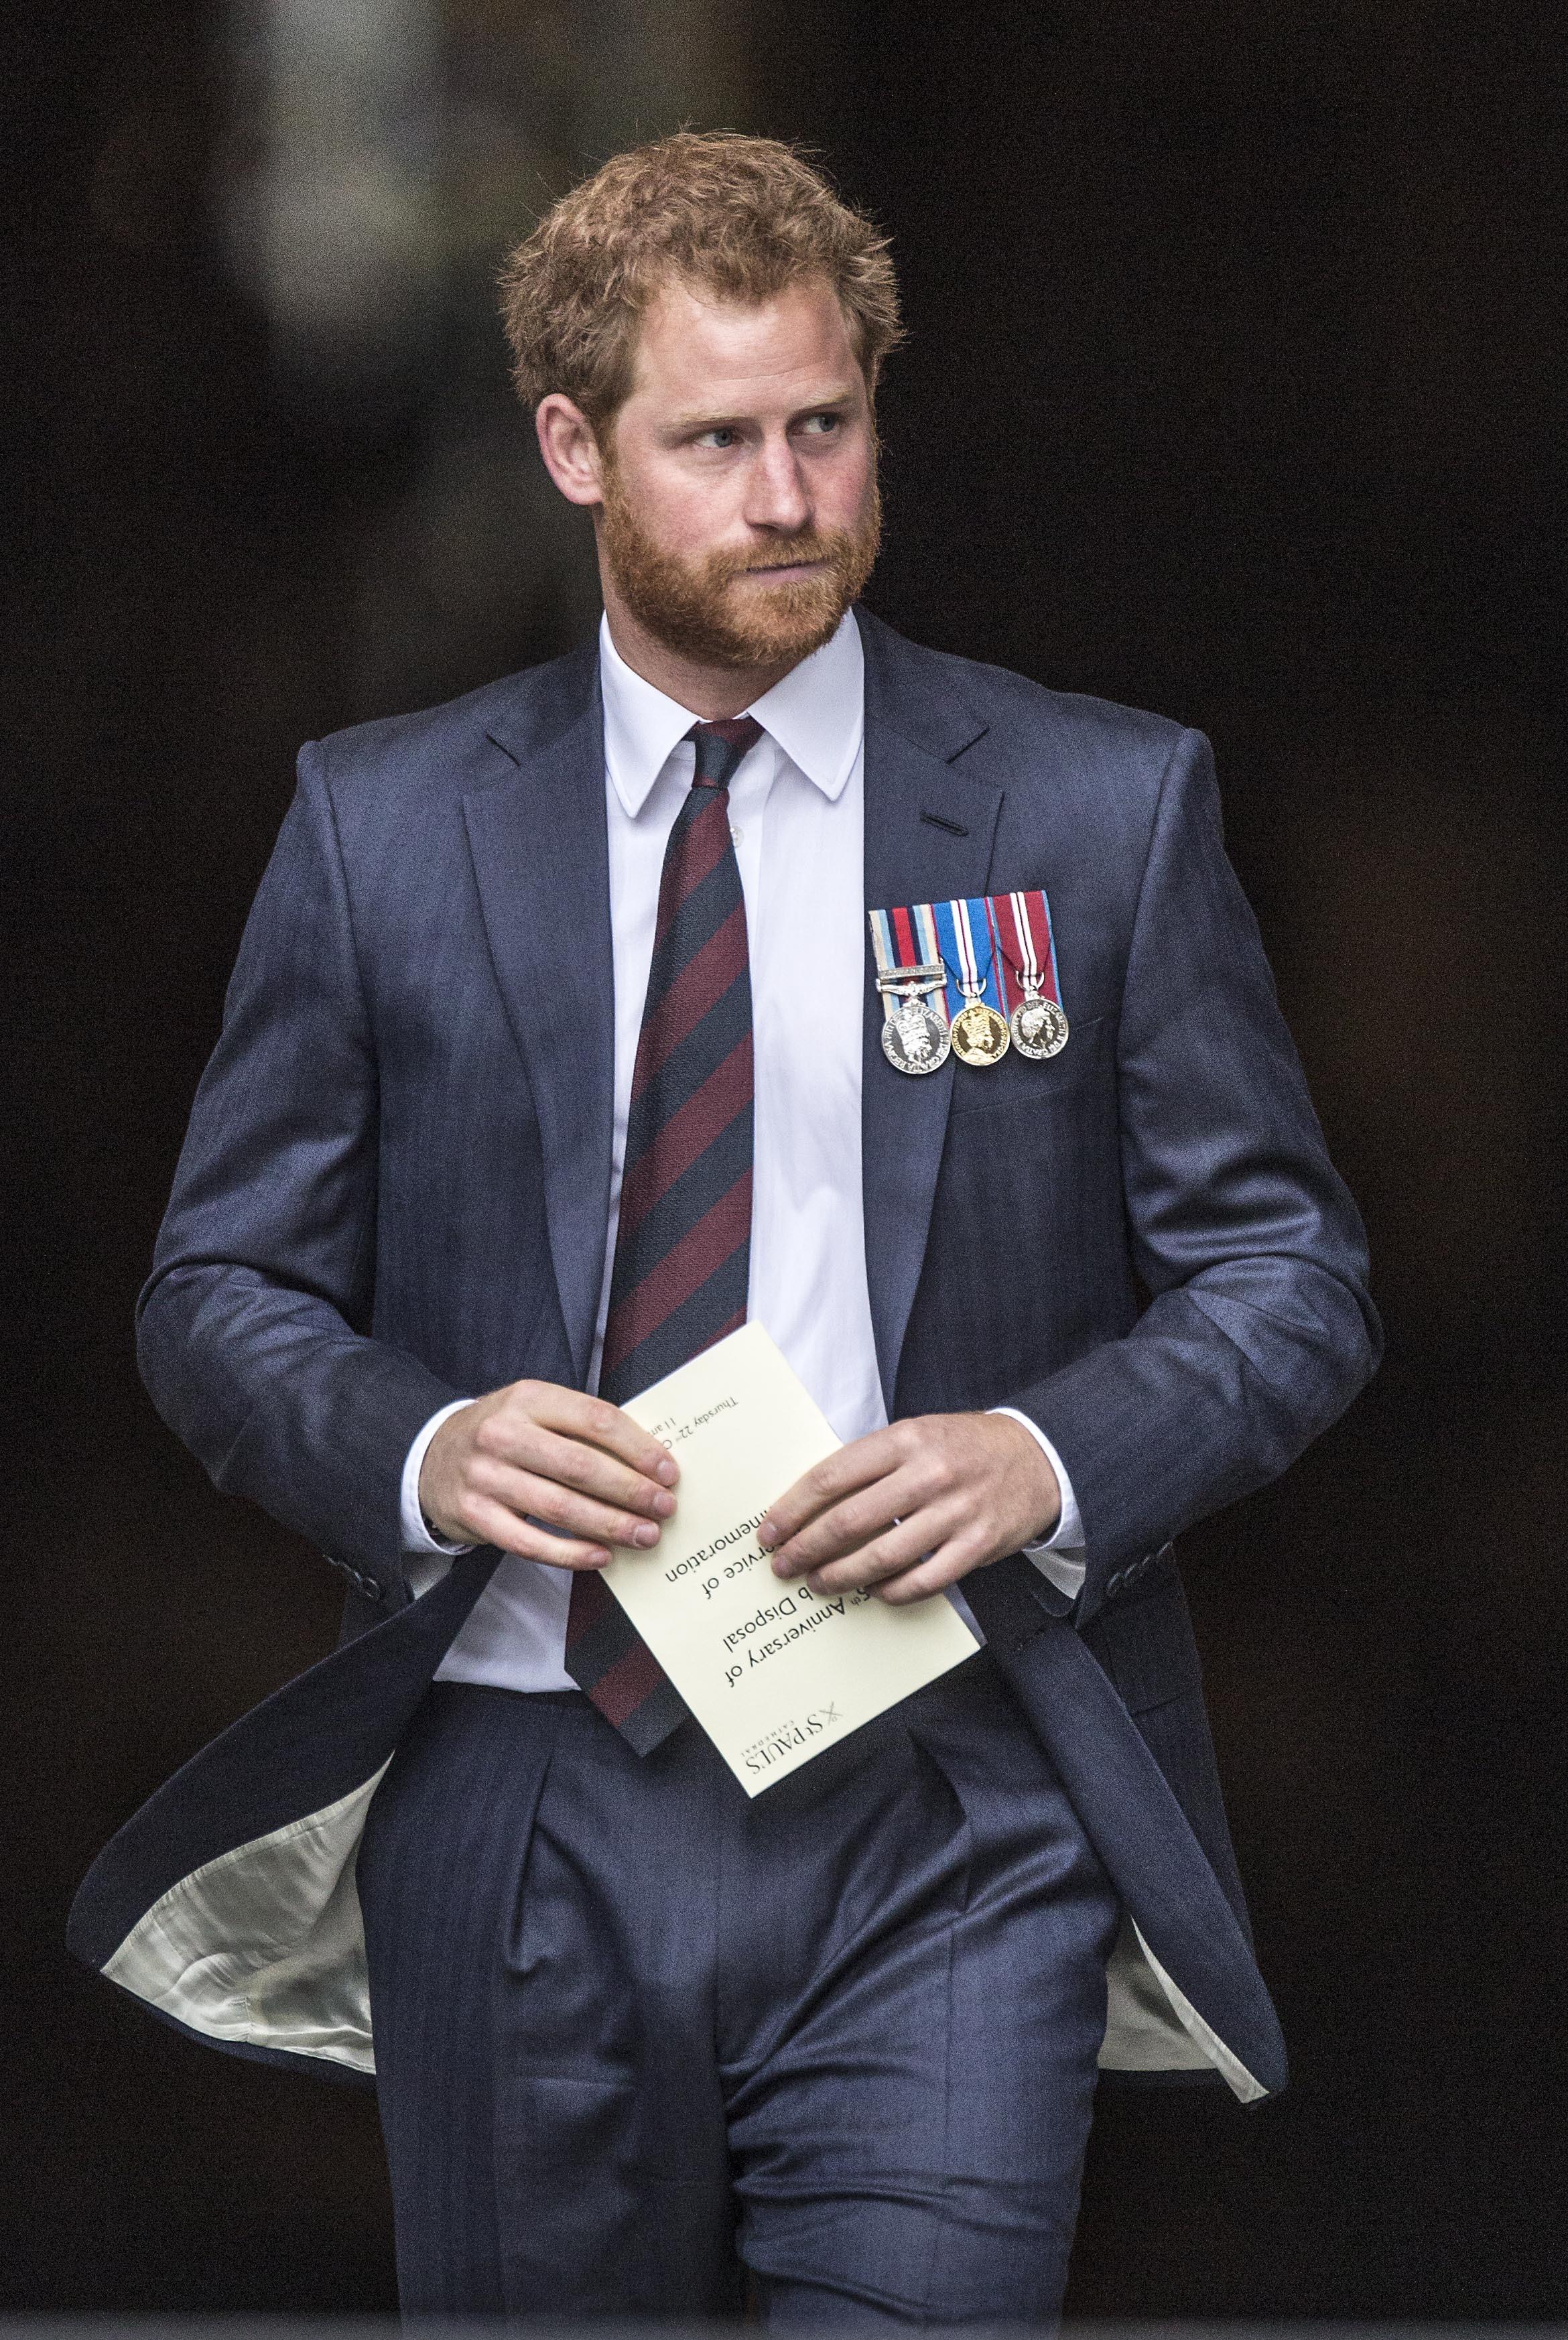 Romance rumors his Prince Harry and a Greek princess